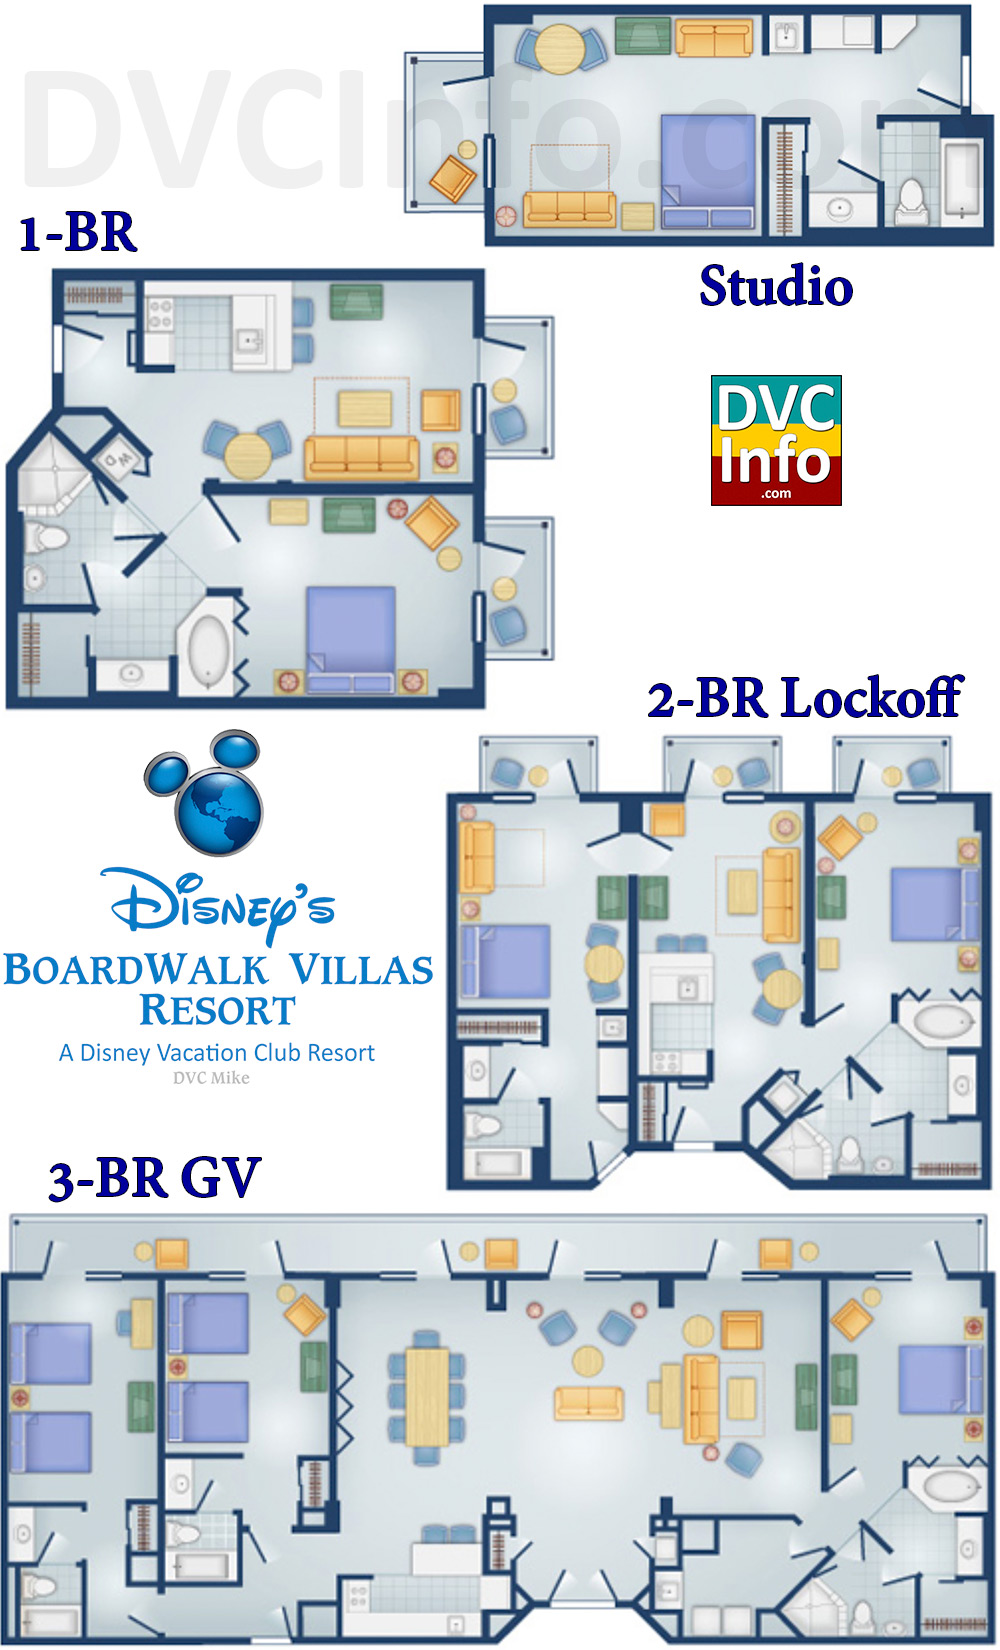 disney s boardwalk villas dvcinfo com floor plans dvc boardwalk resort modern home design and